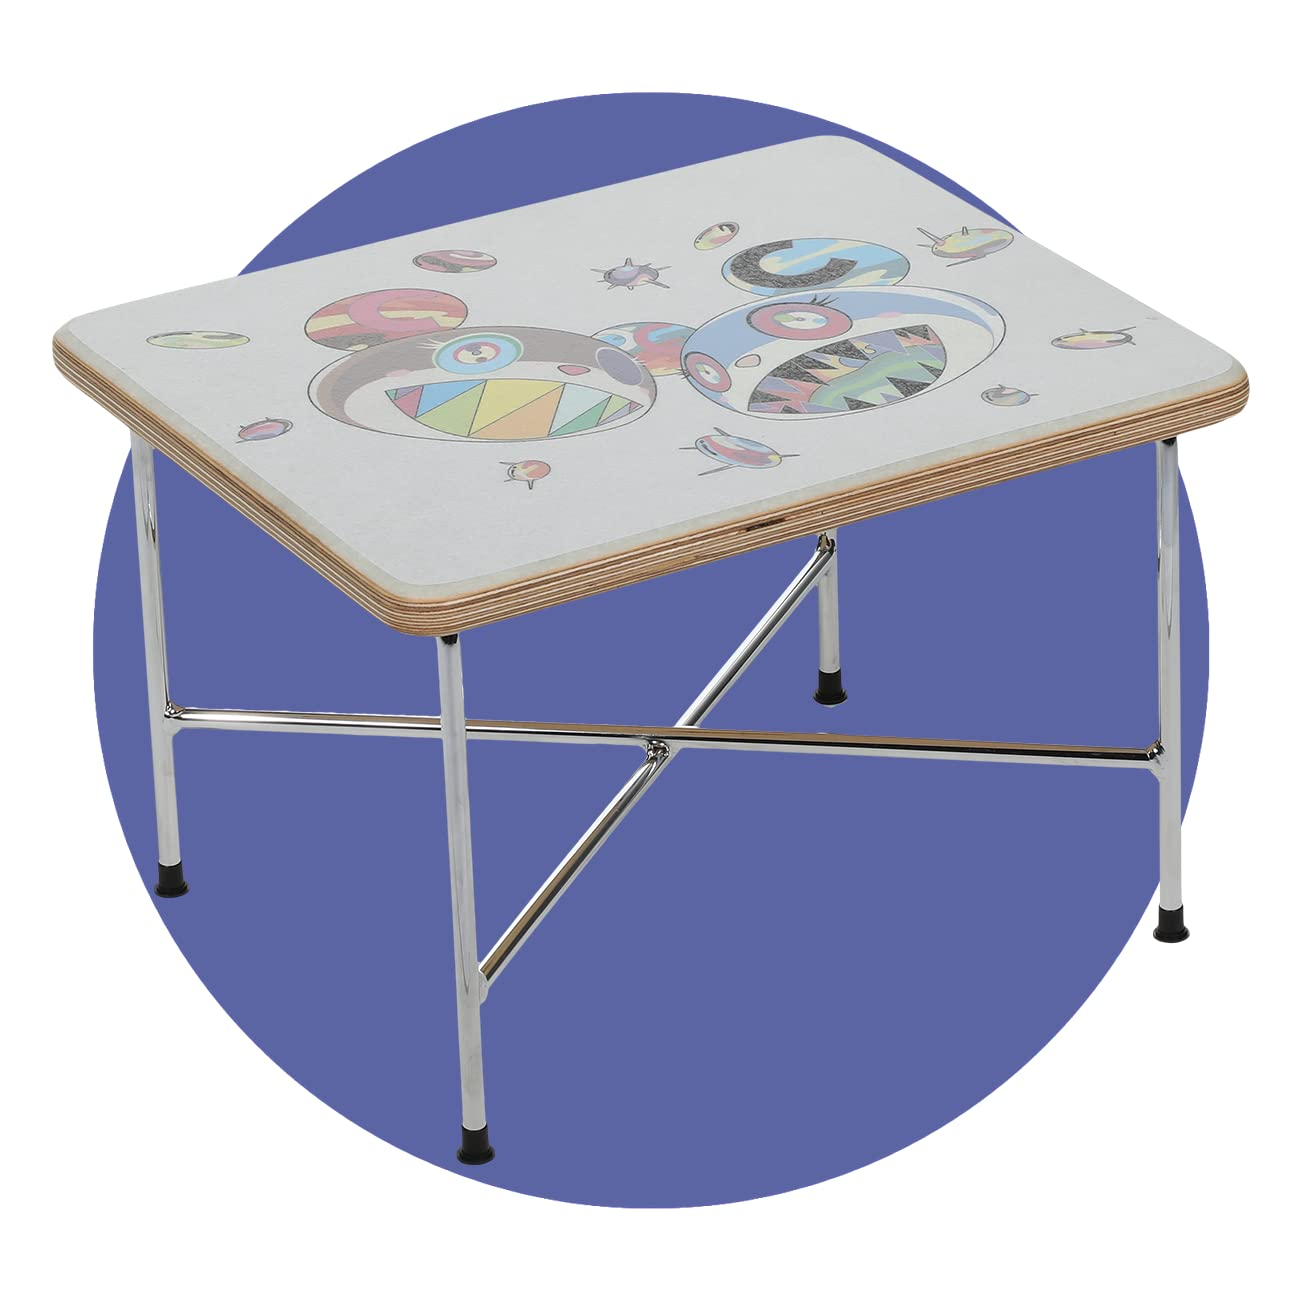 ComplexCon Takashi Murakami x Modernica TMKK Side Table - PreSale